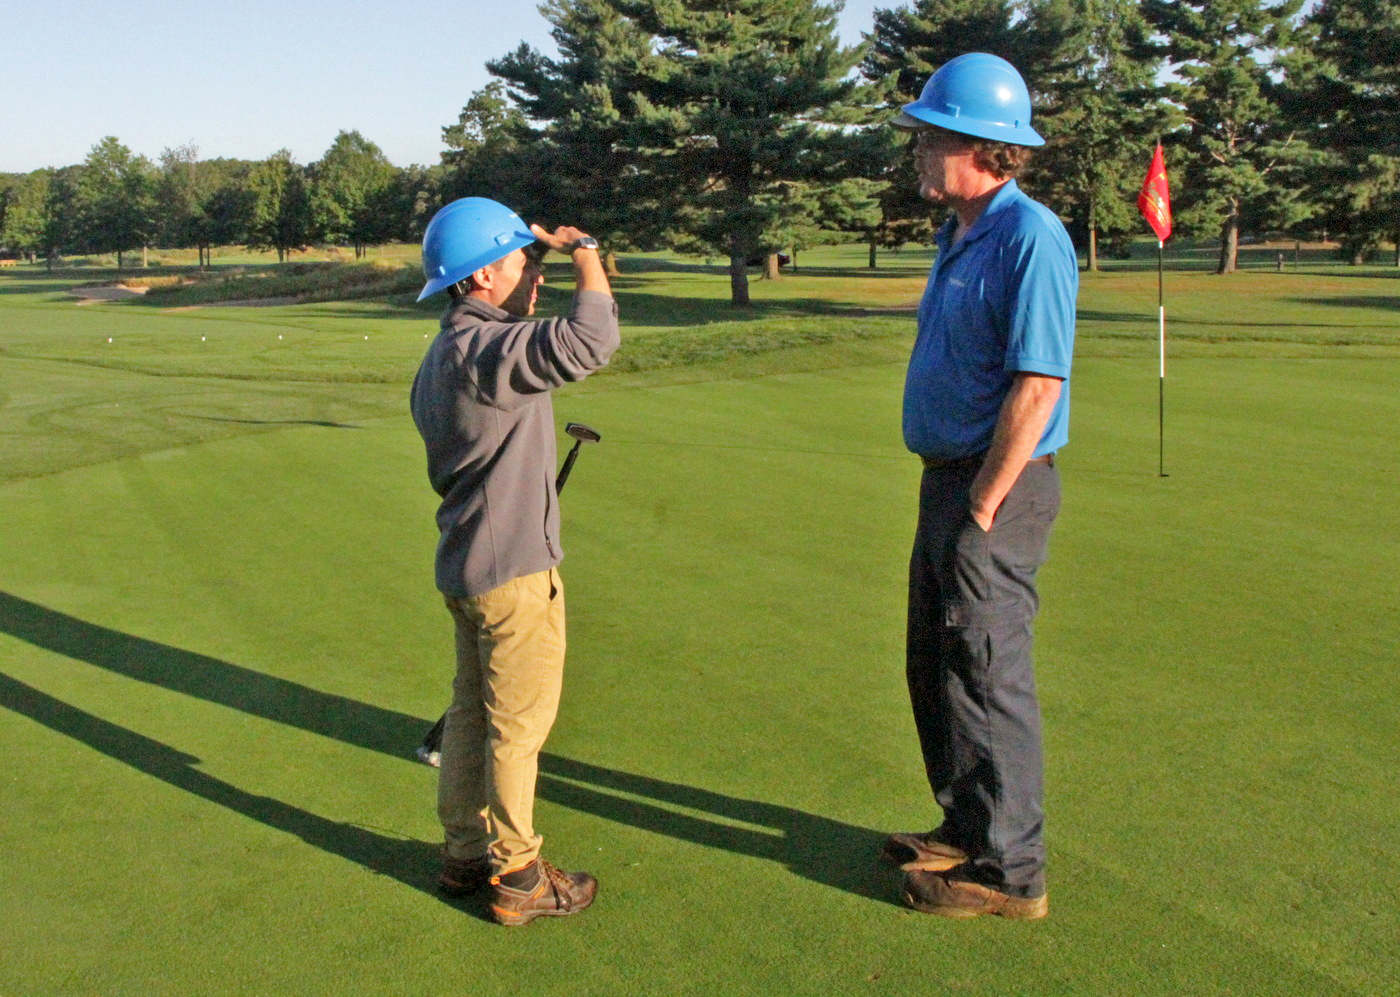 westportnowcom image - Golf Assistant Jobs